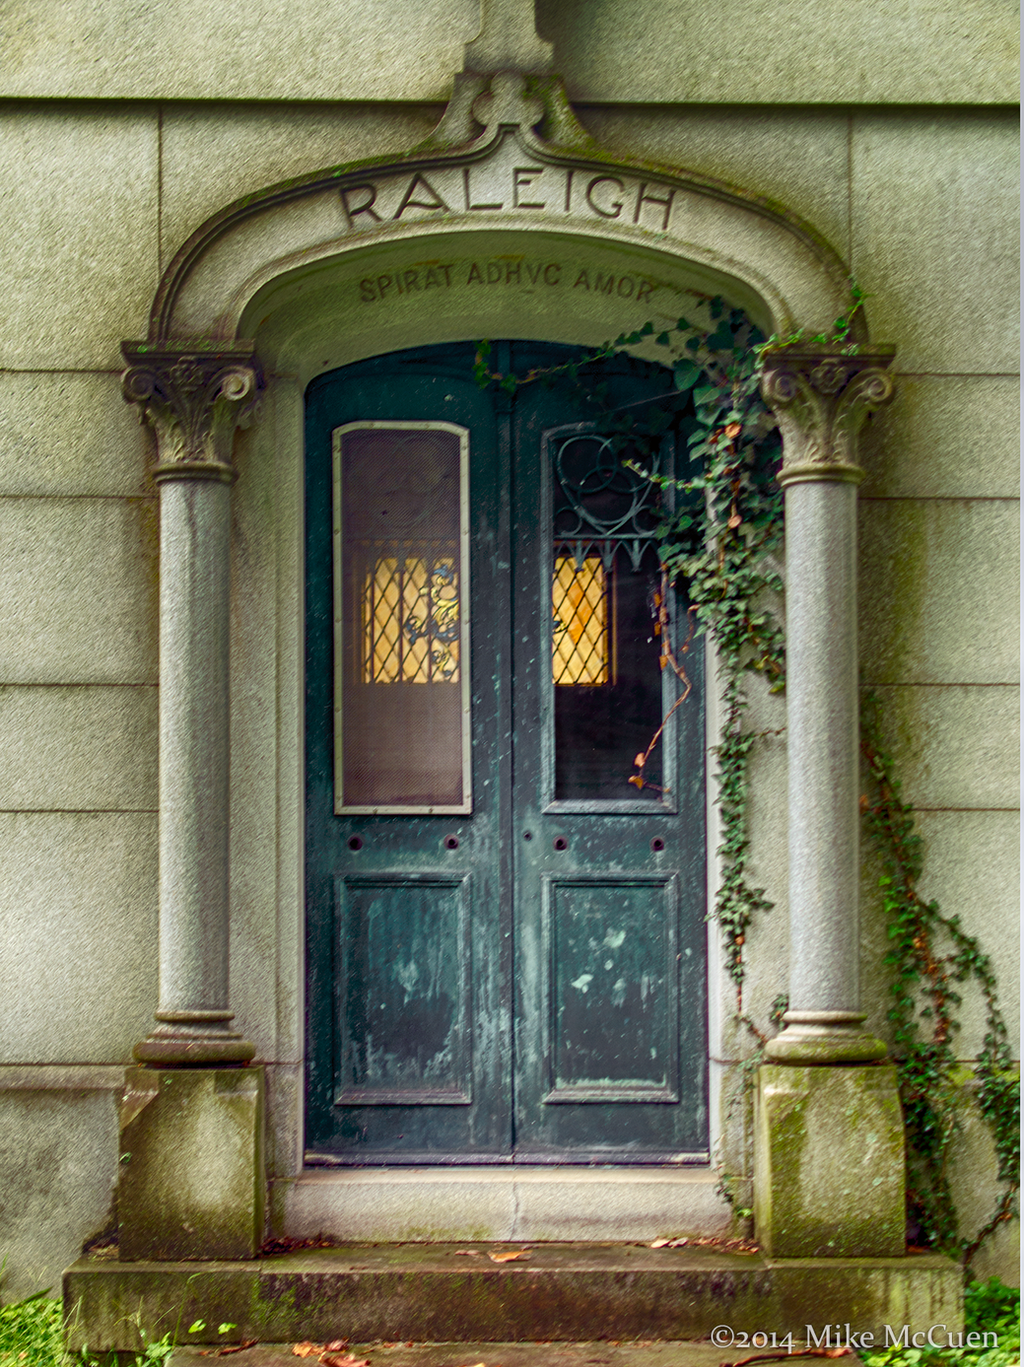 Mausoleum Doors by Sildrotha Mausoleum Doors by Sildrotha & Mausoleum Doors by Sildrotha on DeviantArt Pezcame.Com